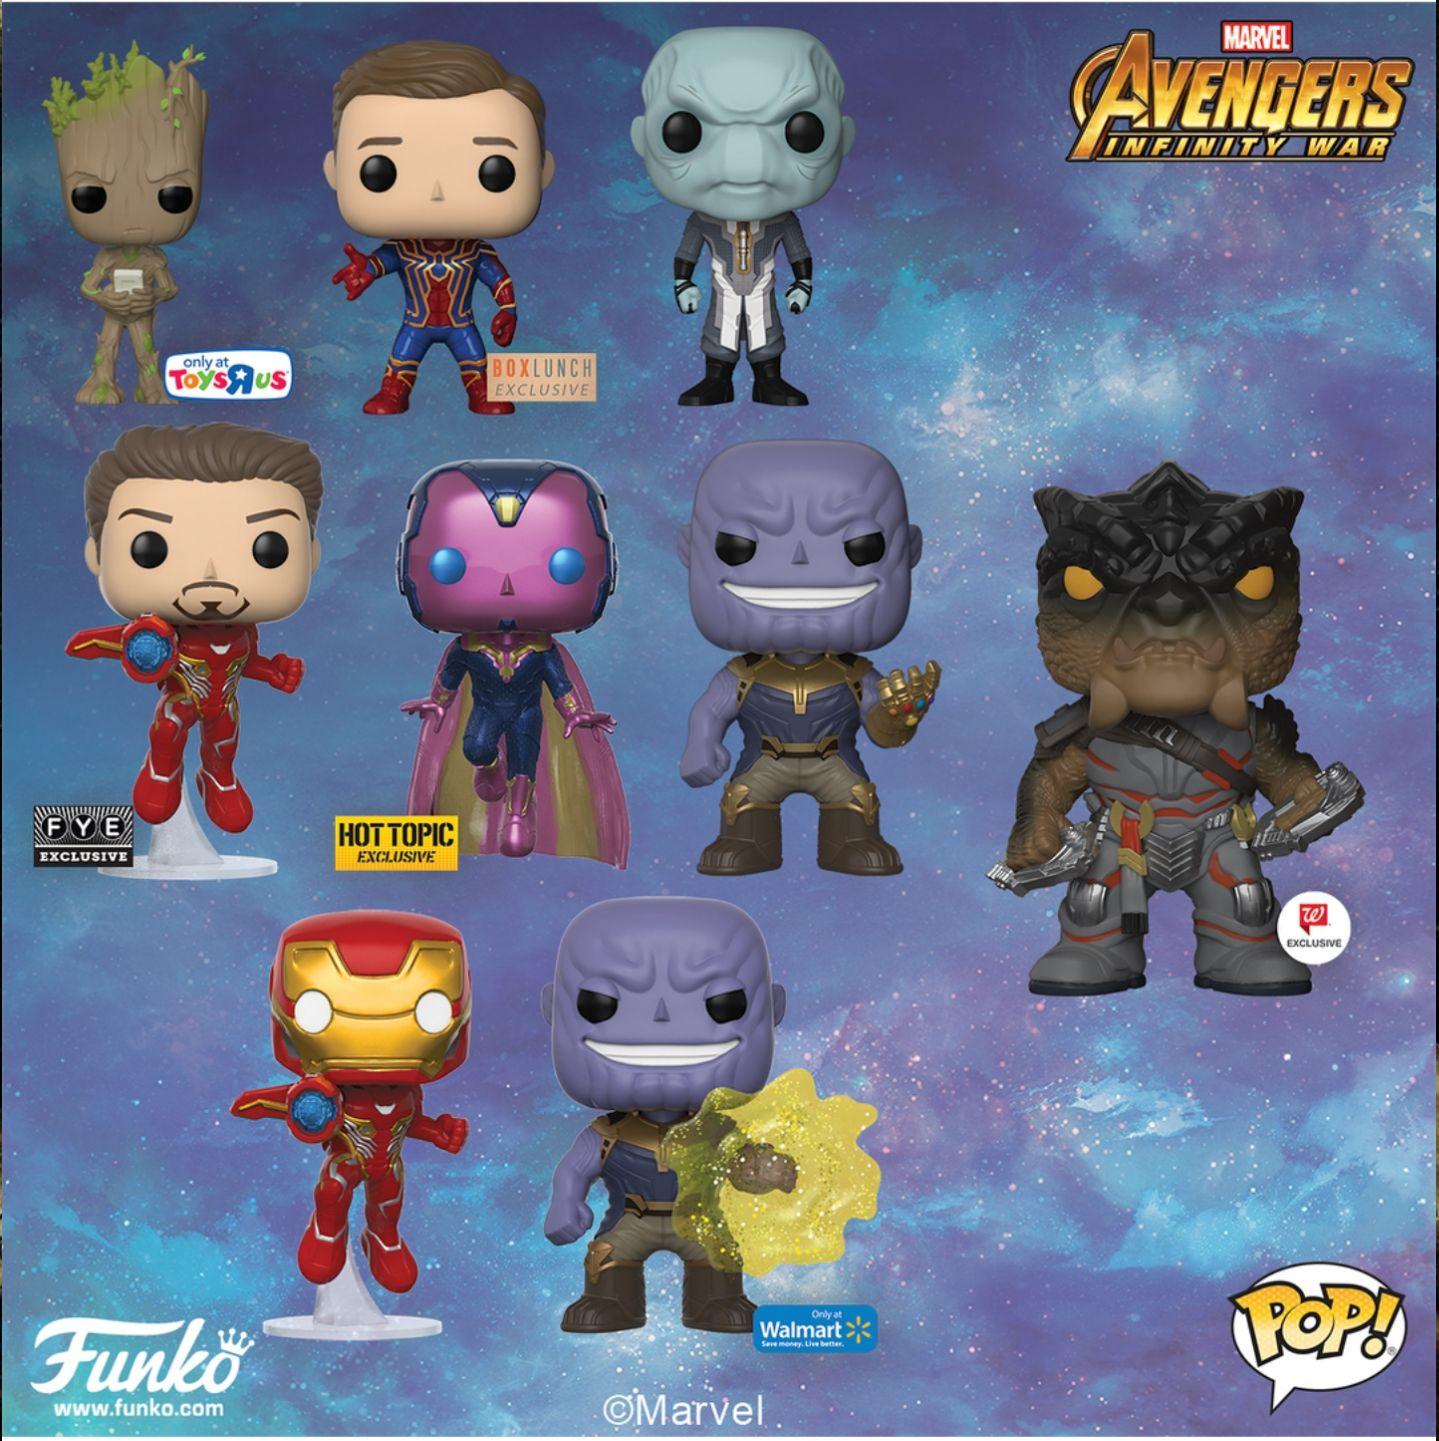 Funko Has A Ton Of New Pops For Avengers Infinity War Funko Pop Dolls Funko Pop Toys Funko